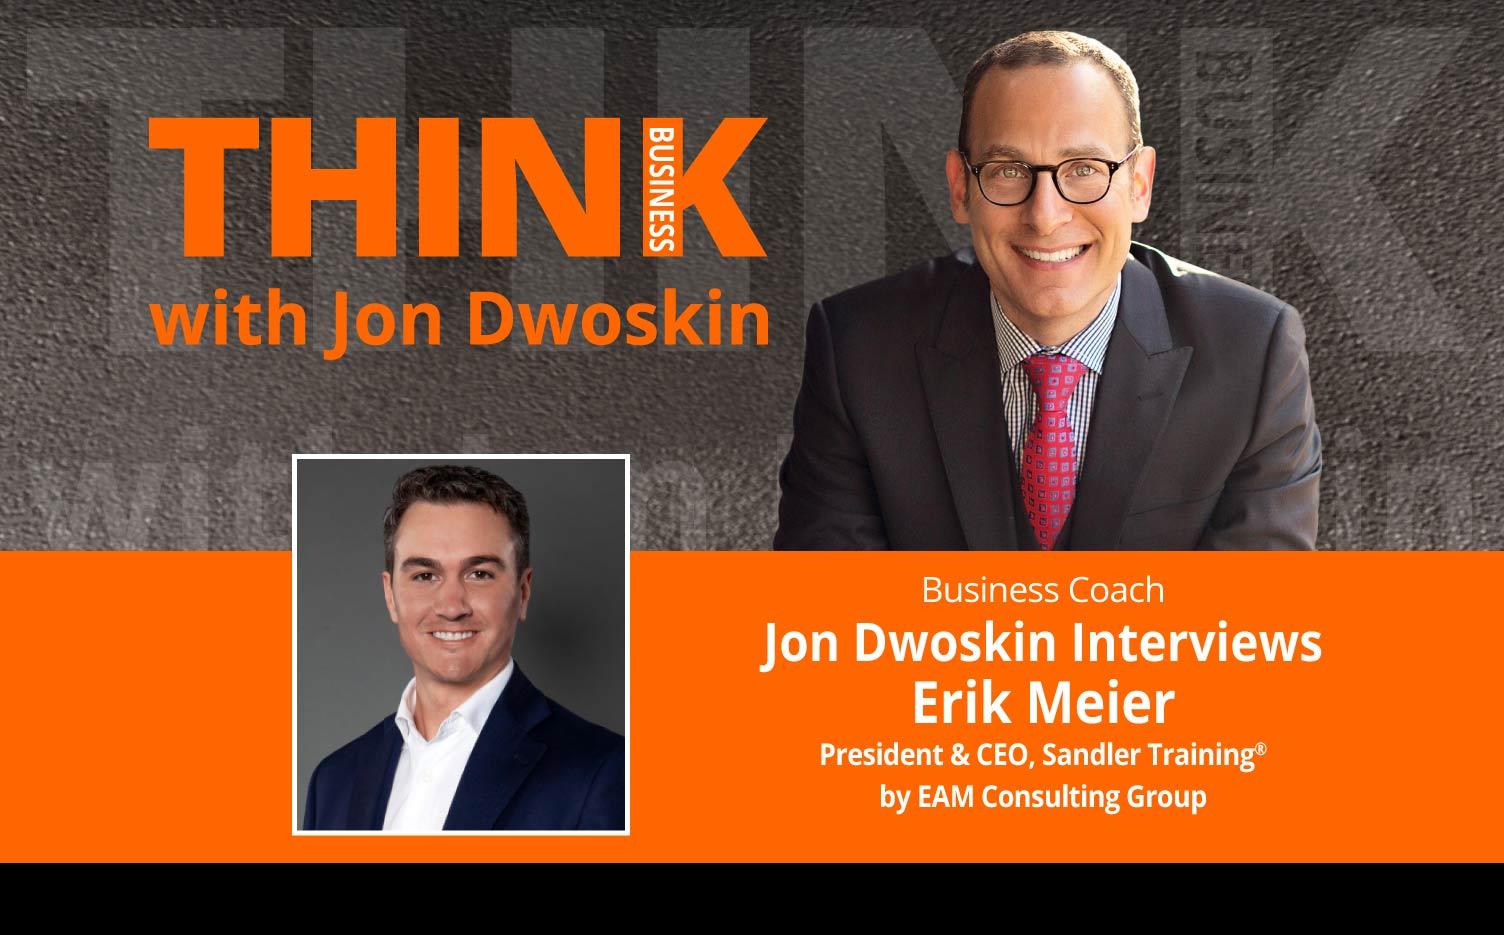 THINK Business Podcast: Jon Dwoskin Interviews Erik Meier, President & CEO, Sandler Training® by EAM Consulting Group